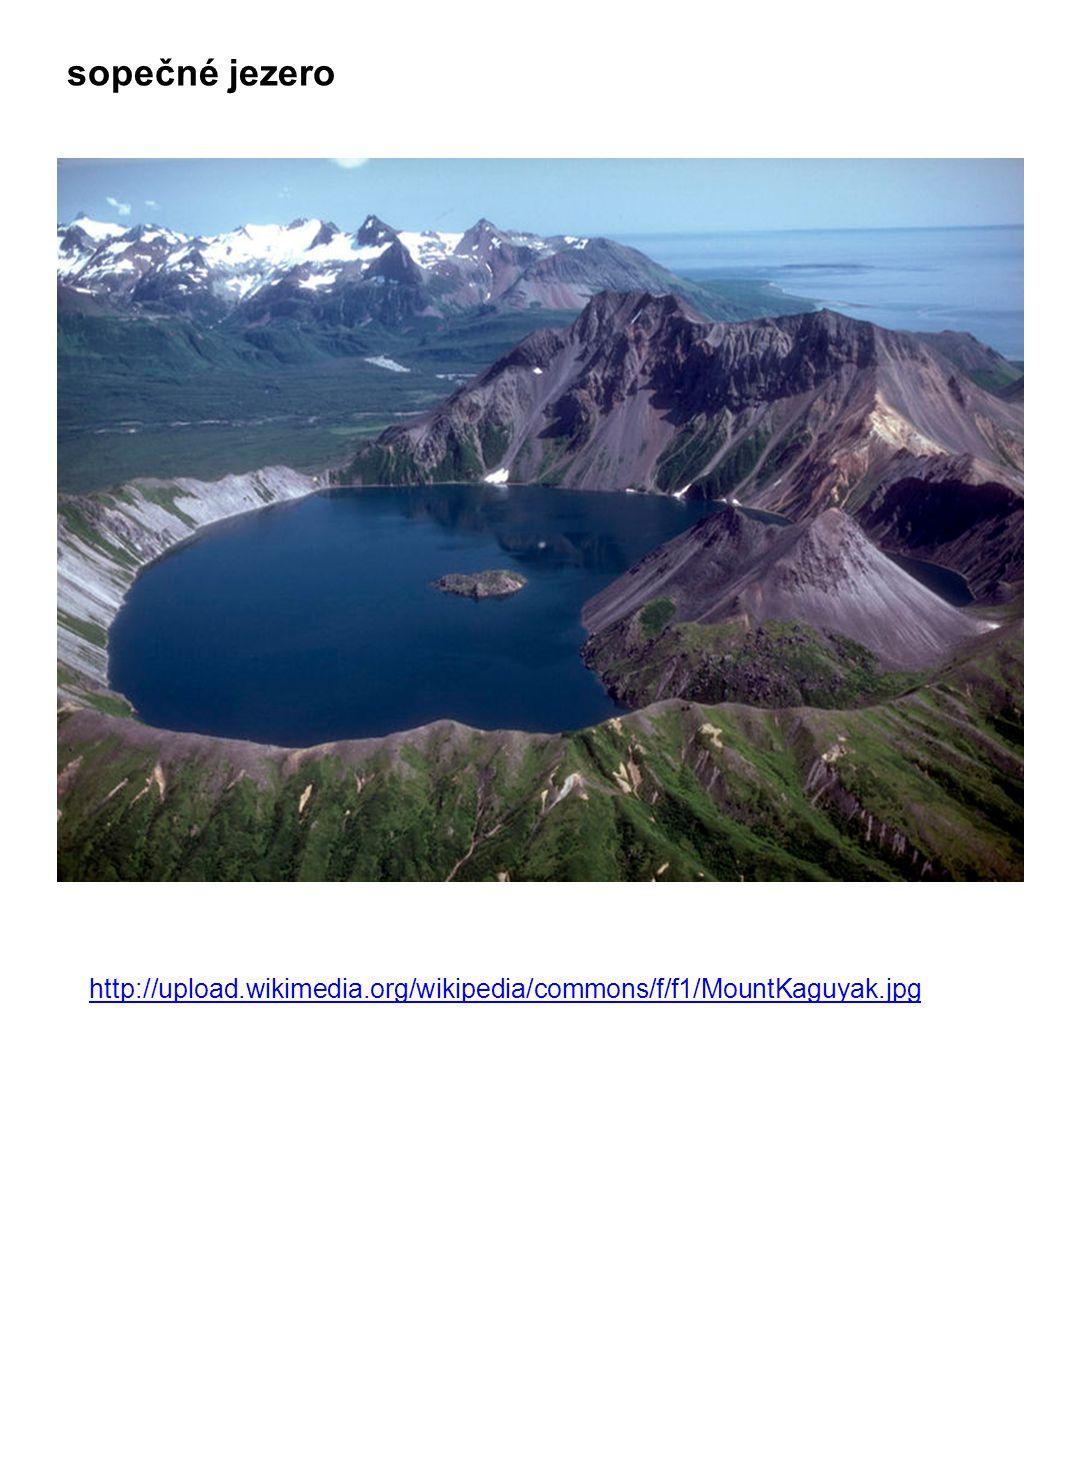 sopečné jezero http://upload.wikimedia.org/wikipedia/commons/f/f1/MountKaguyak.jpg